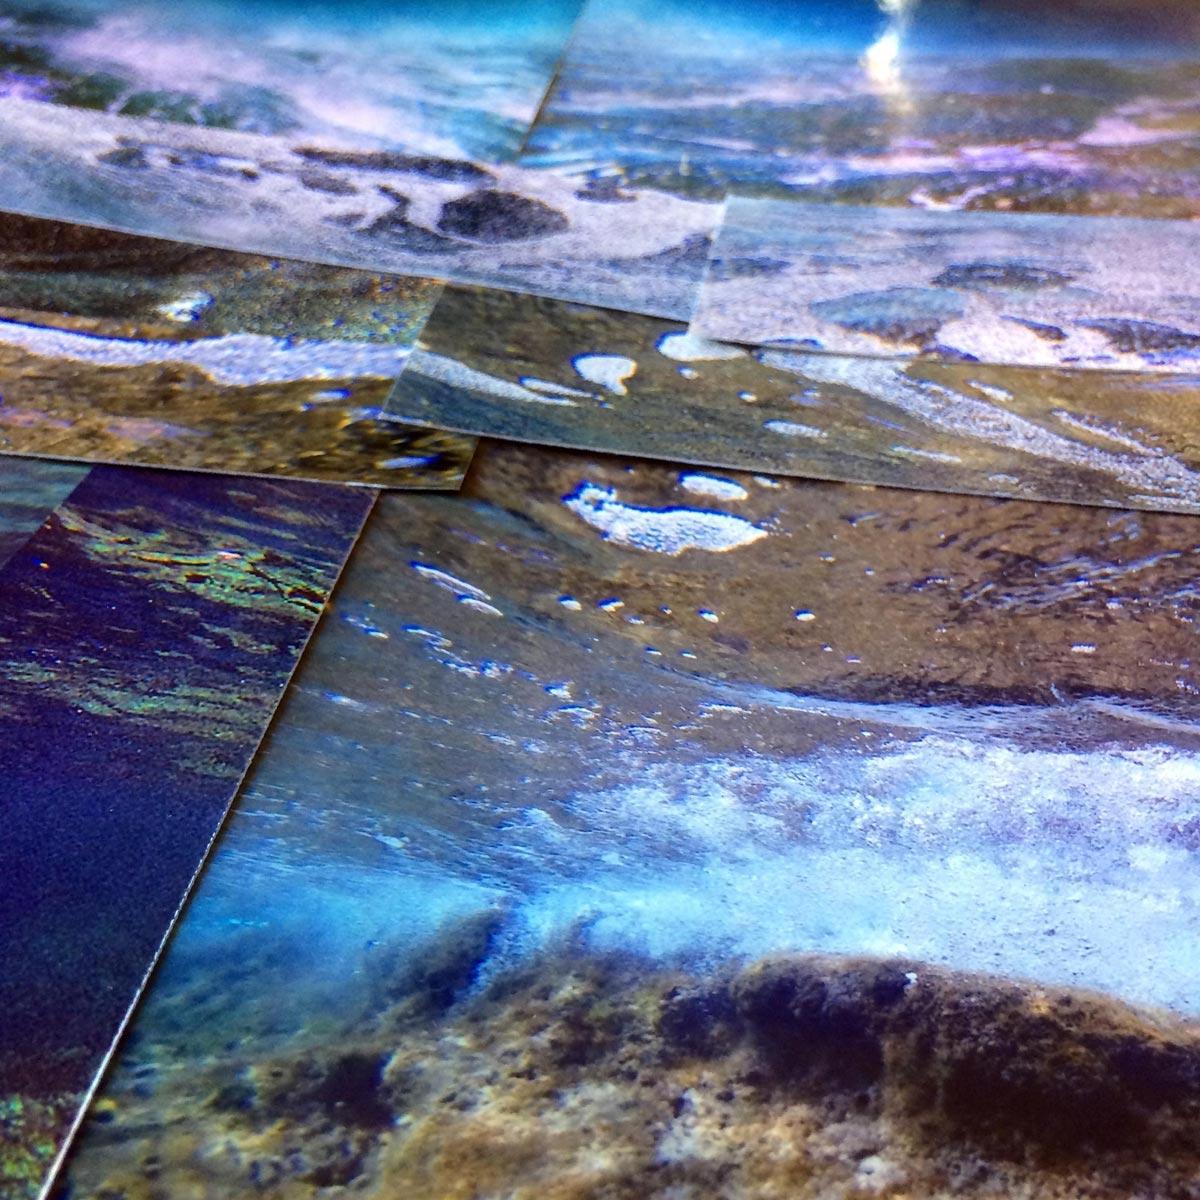 humeur V2 - EmPinsan - collage photo